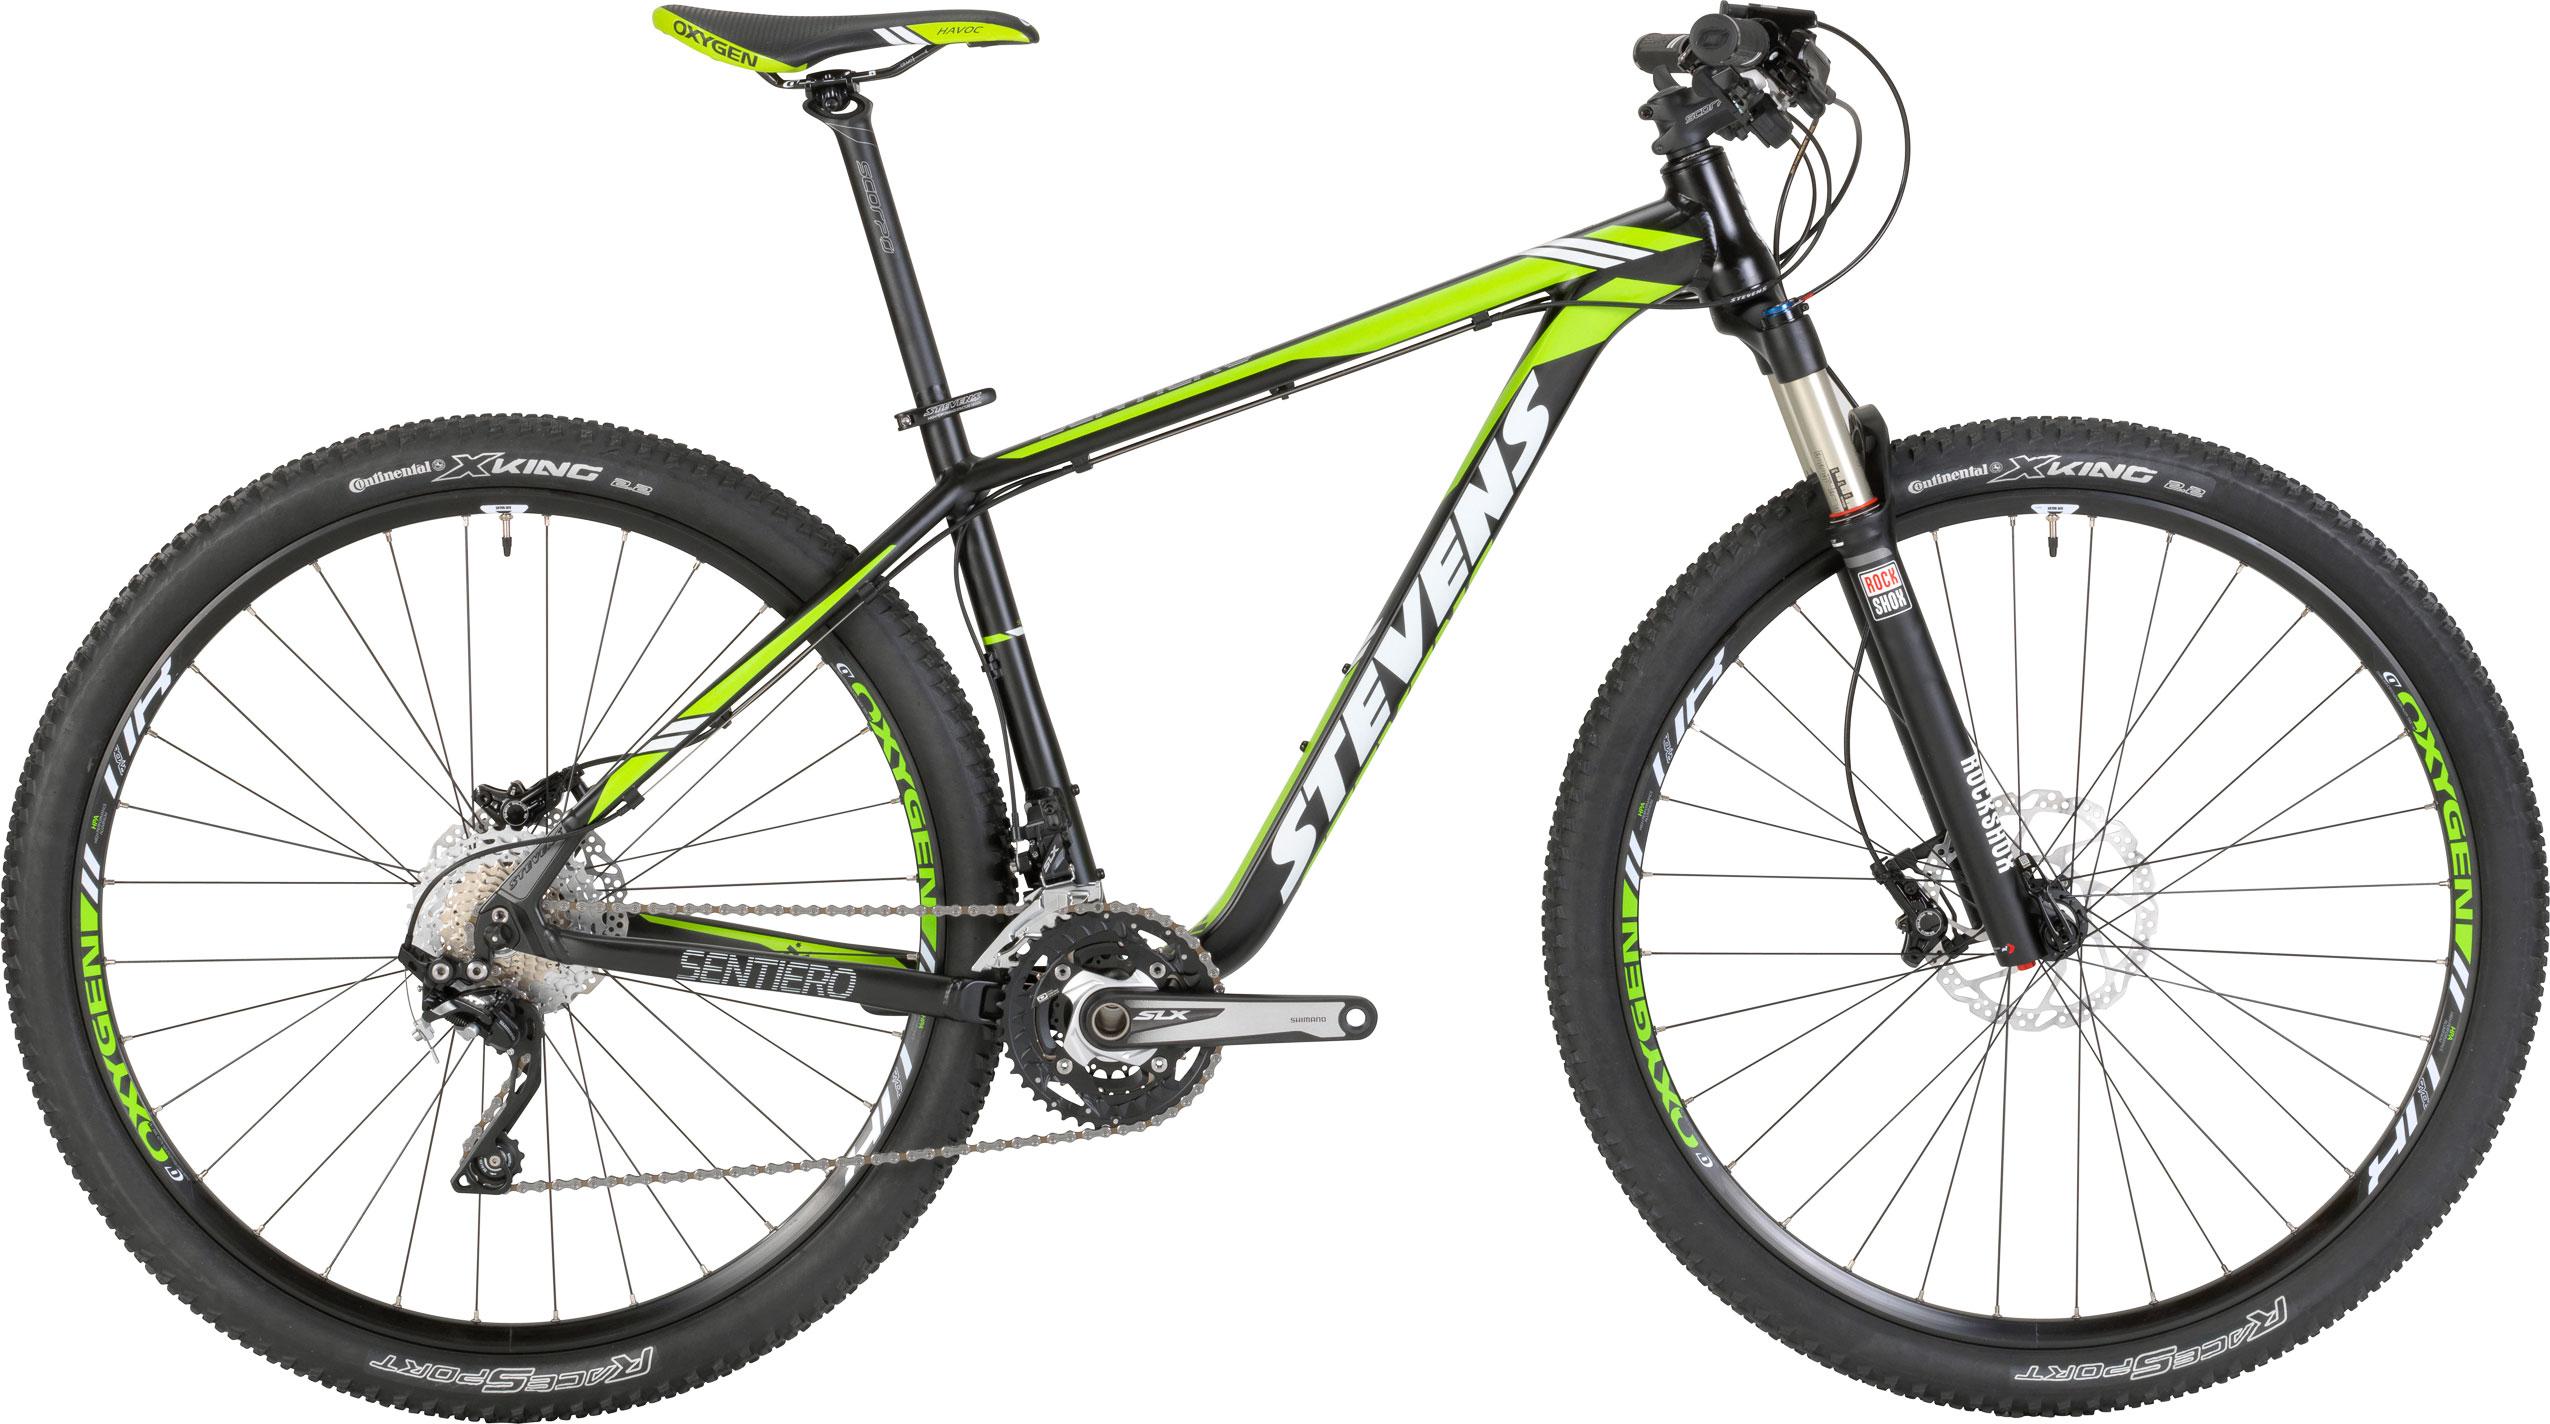 Stevens Sentiero Mountainbike